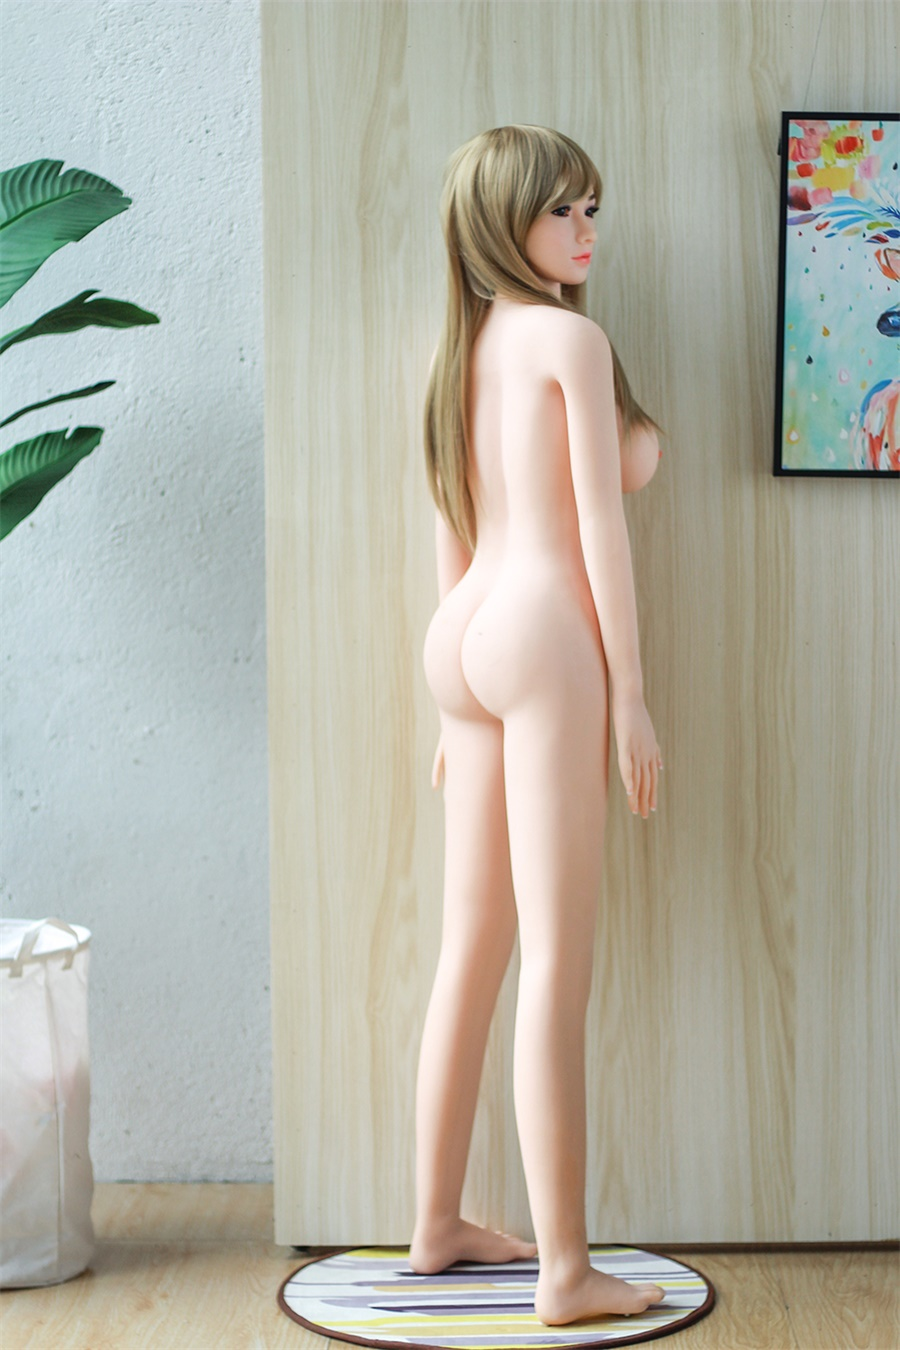 Hfc7b4e7b9e6248bf997dfc068778c8a6q 158Cm Real Silicone Japanese Anime Girl Sex Dolls Artificial Breast Oral Vagina Full AV Tits Poupee for Men Ass Pussy Porno Toys